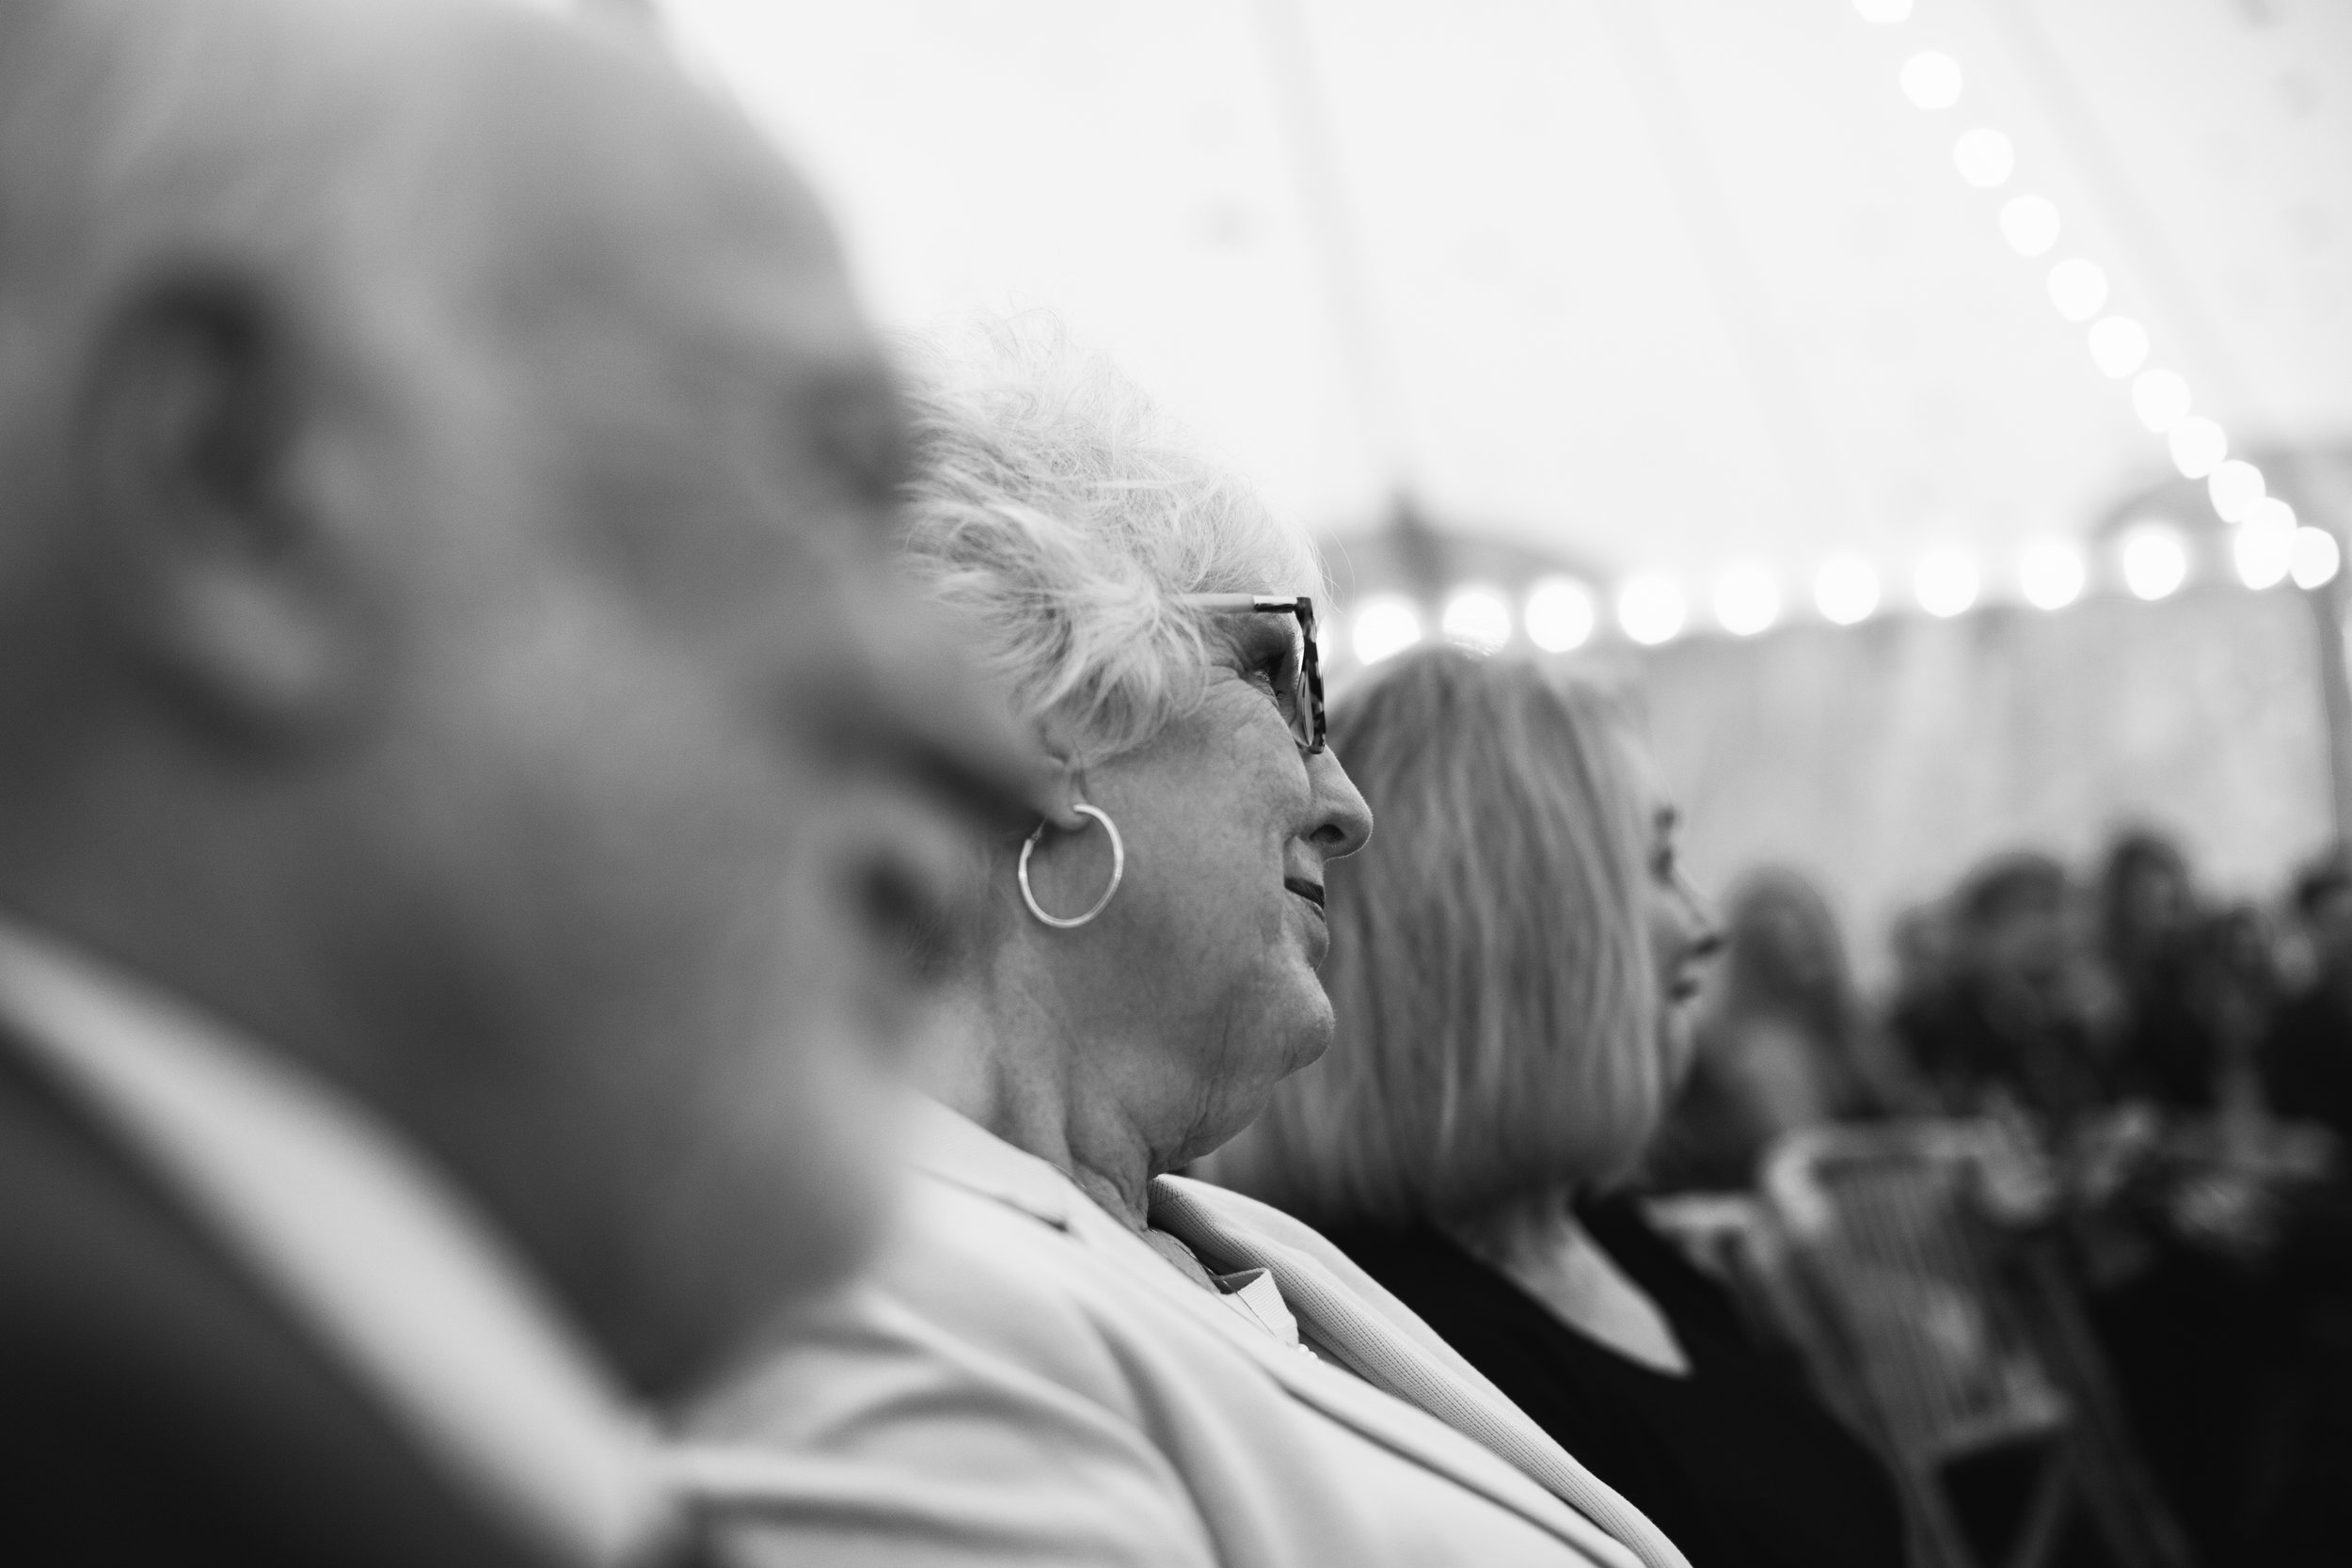 grandmother watching wedding ceremony